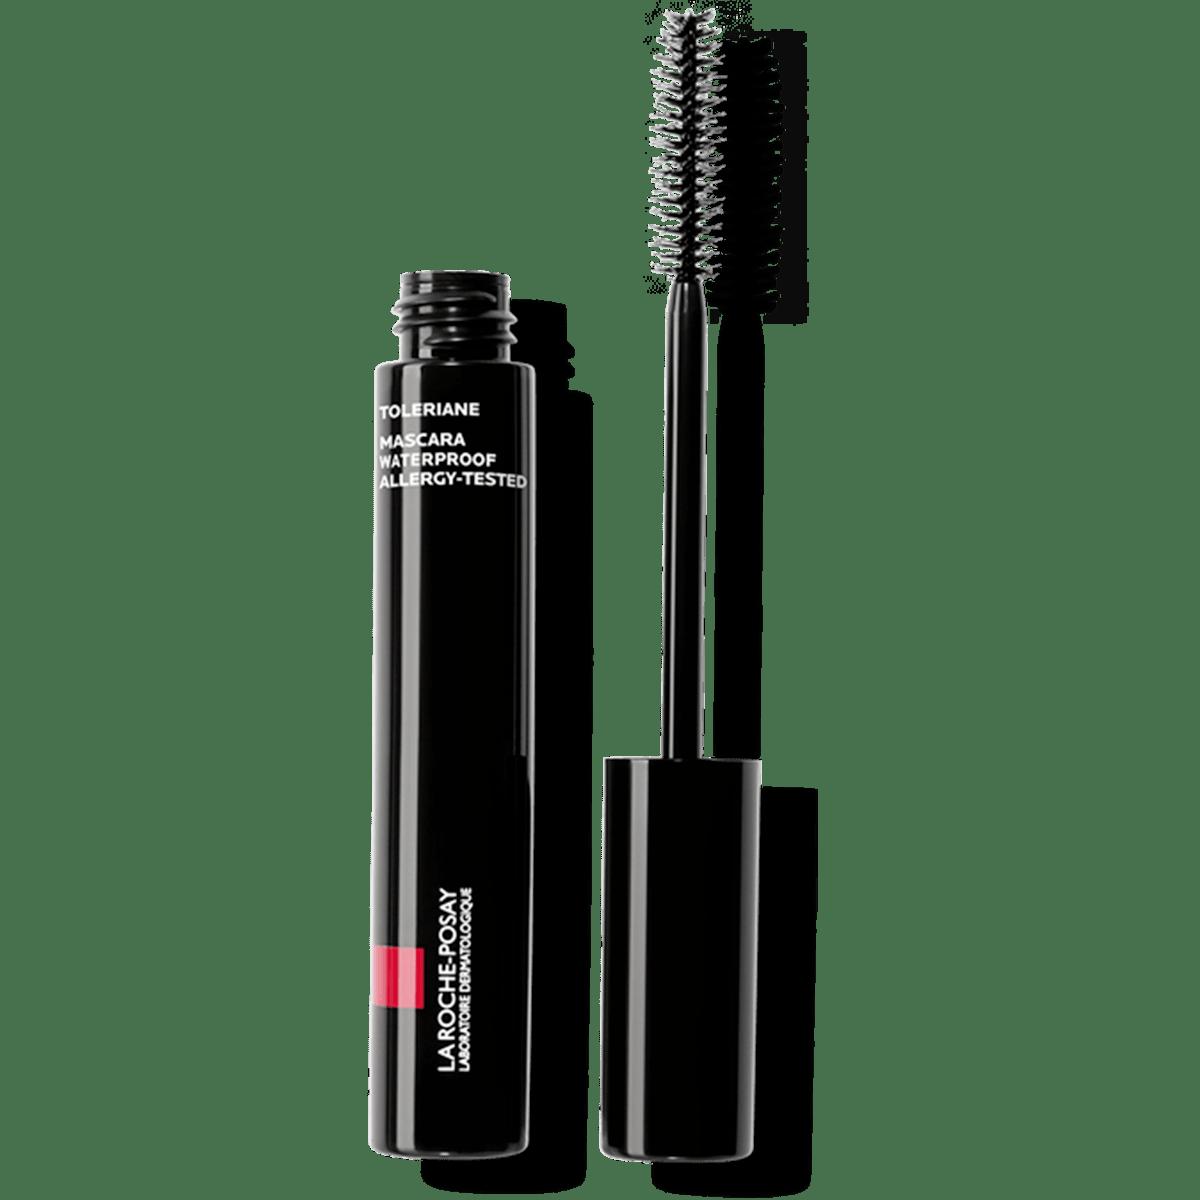 La Roche Posay Herkkä Toleriane Make up WATERPROOF MASCARA Black 33